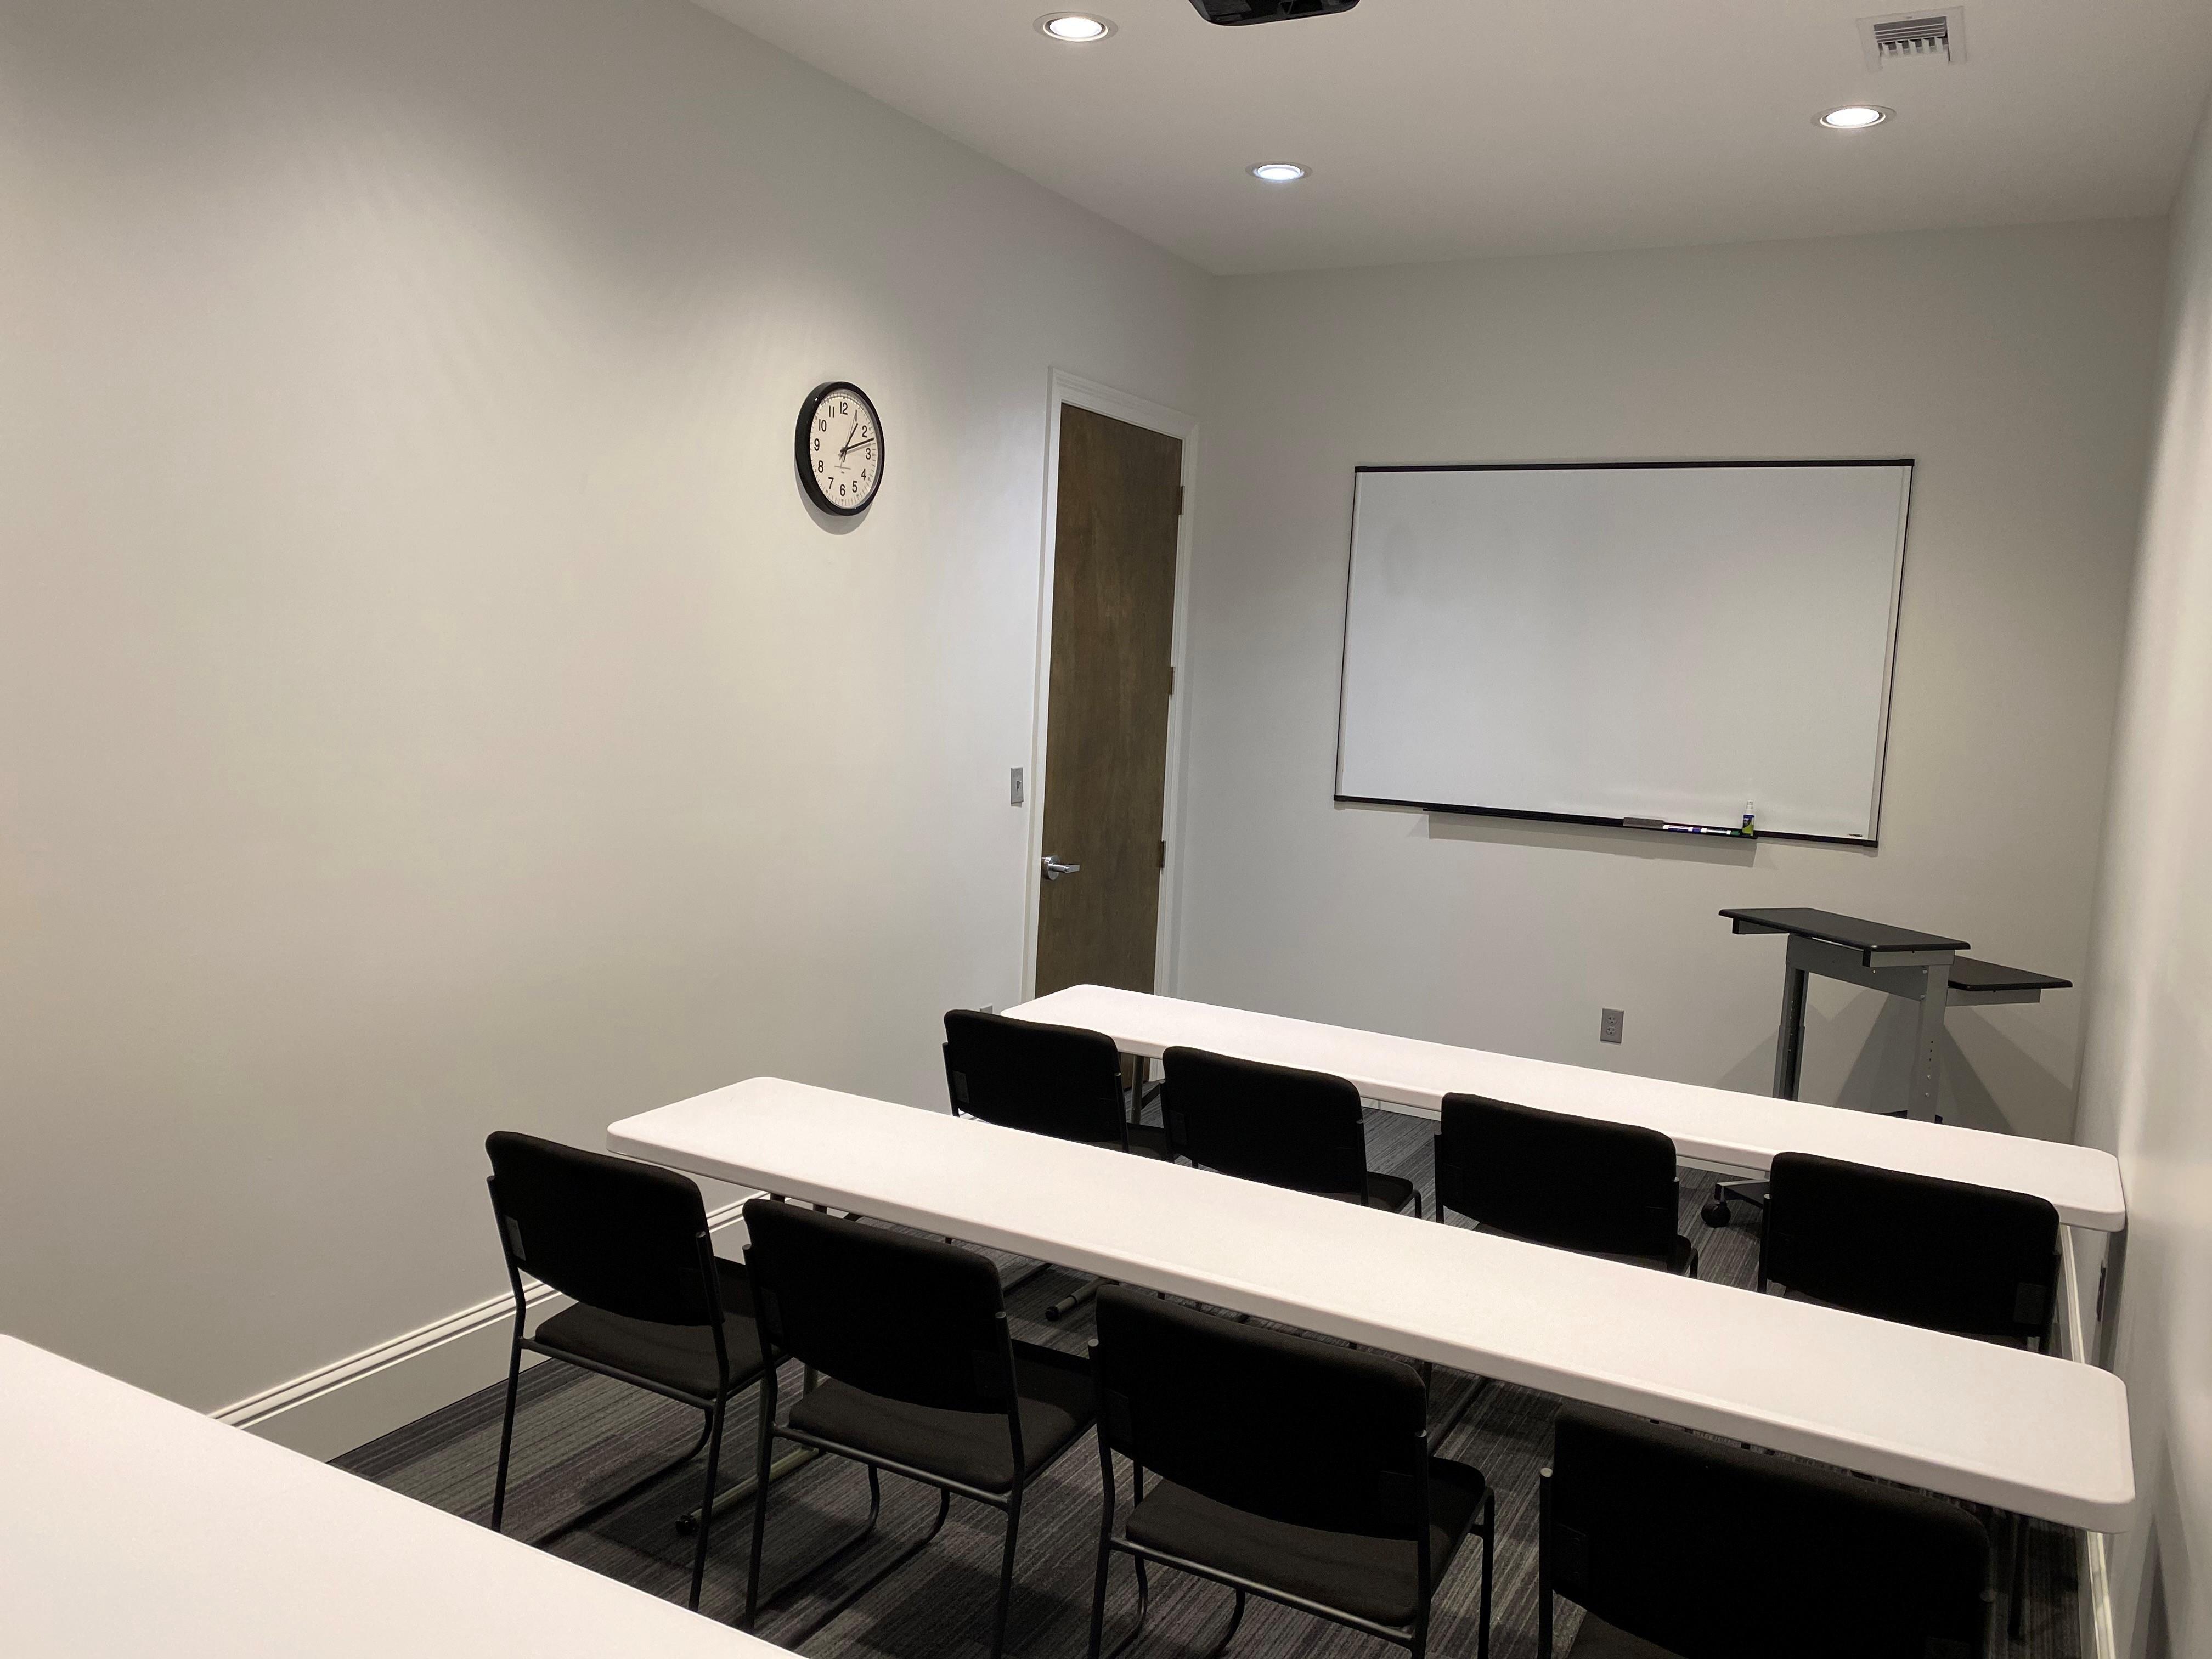 Training Room - 1 Hour